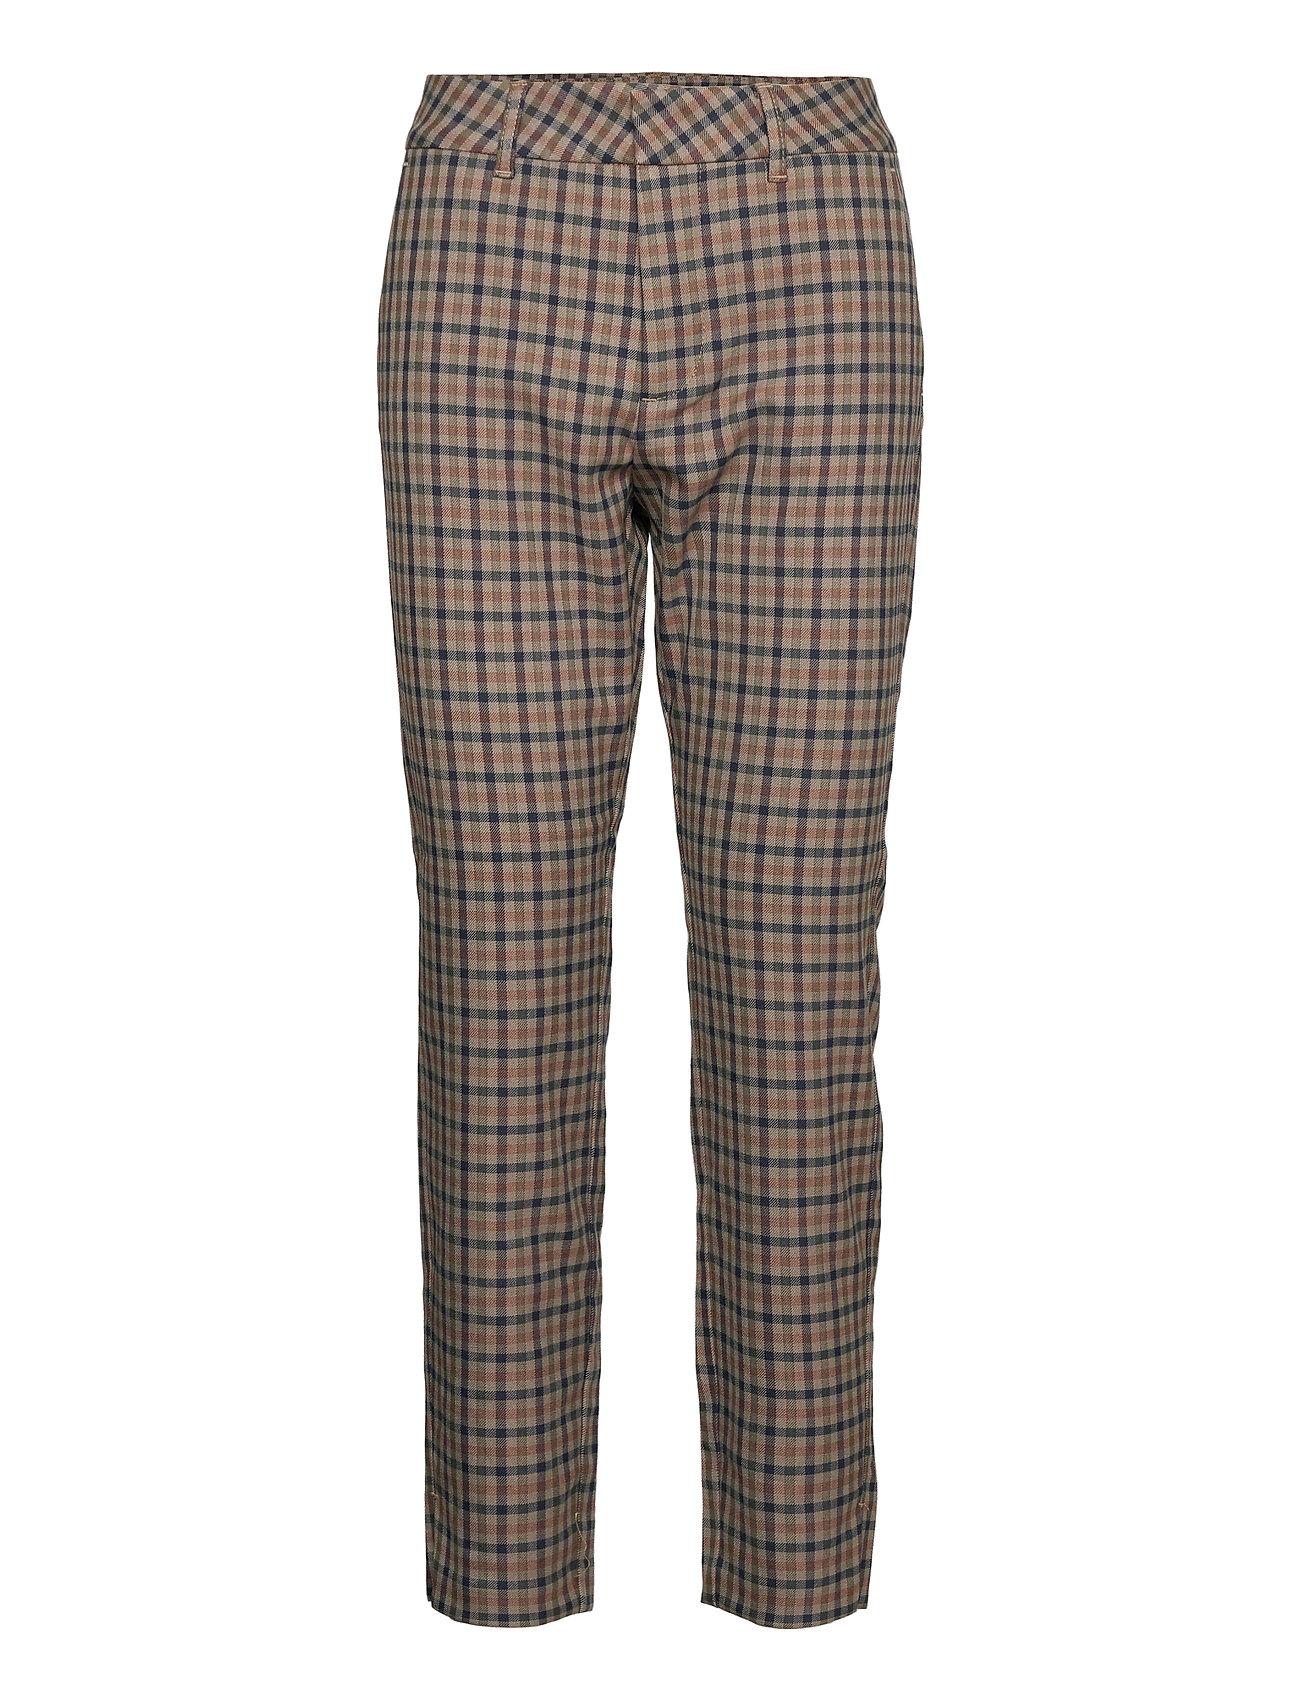 Image of Pzclara Pant Slimfit Bukser Grå Pulz Jeans (3452243793)